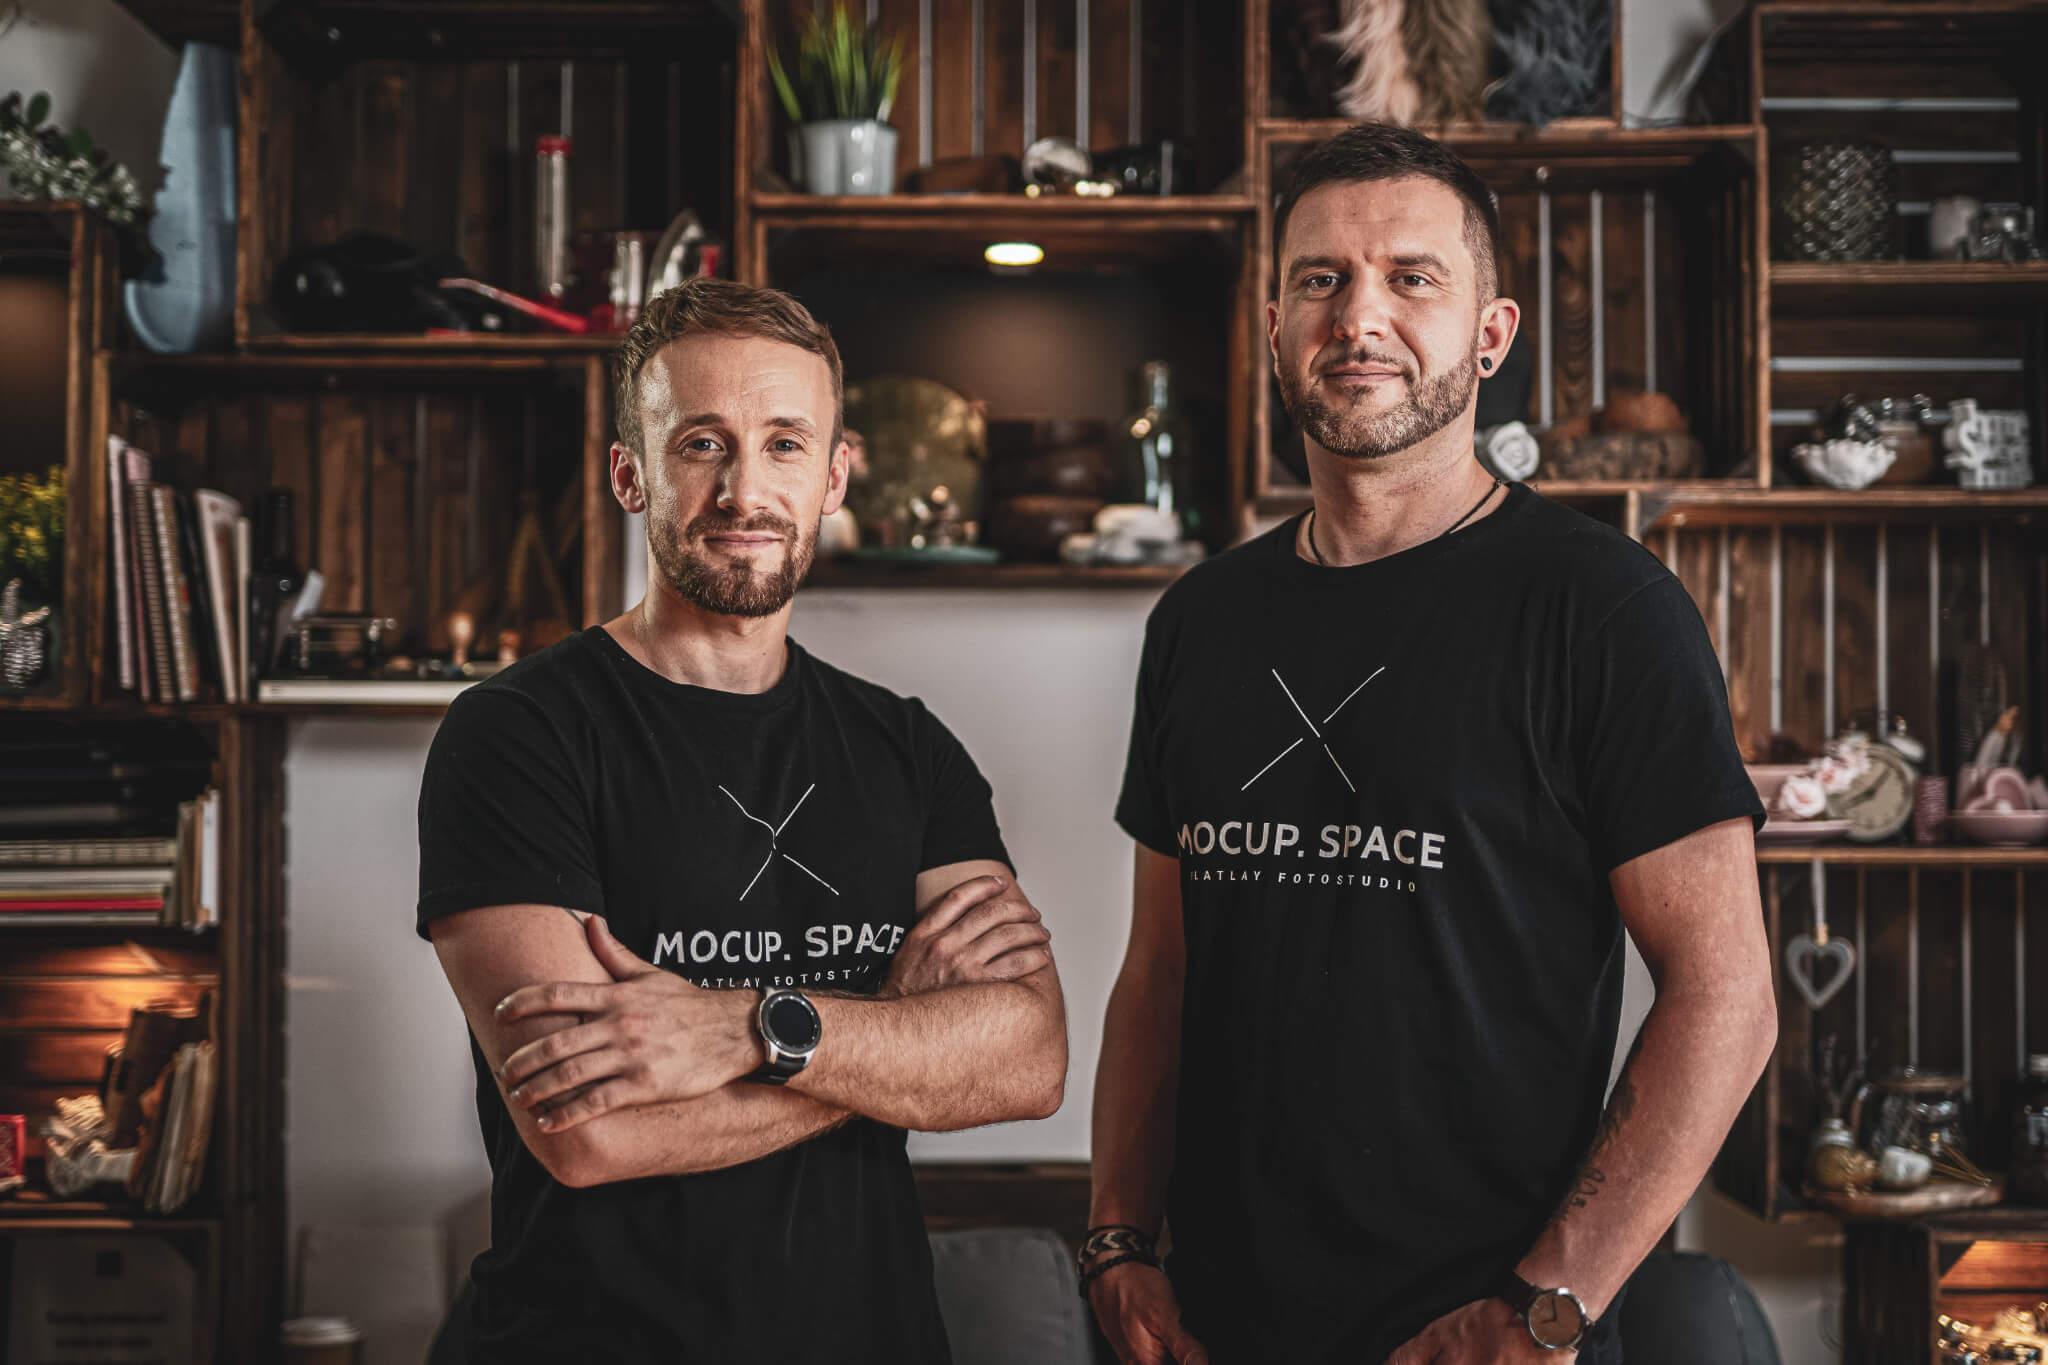 Mocup. space – Peter Konopásek a Juraj Guráň